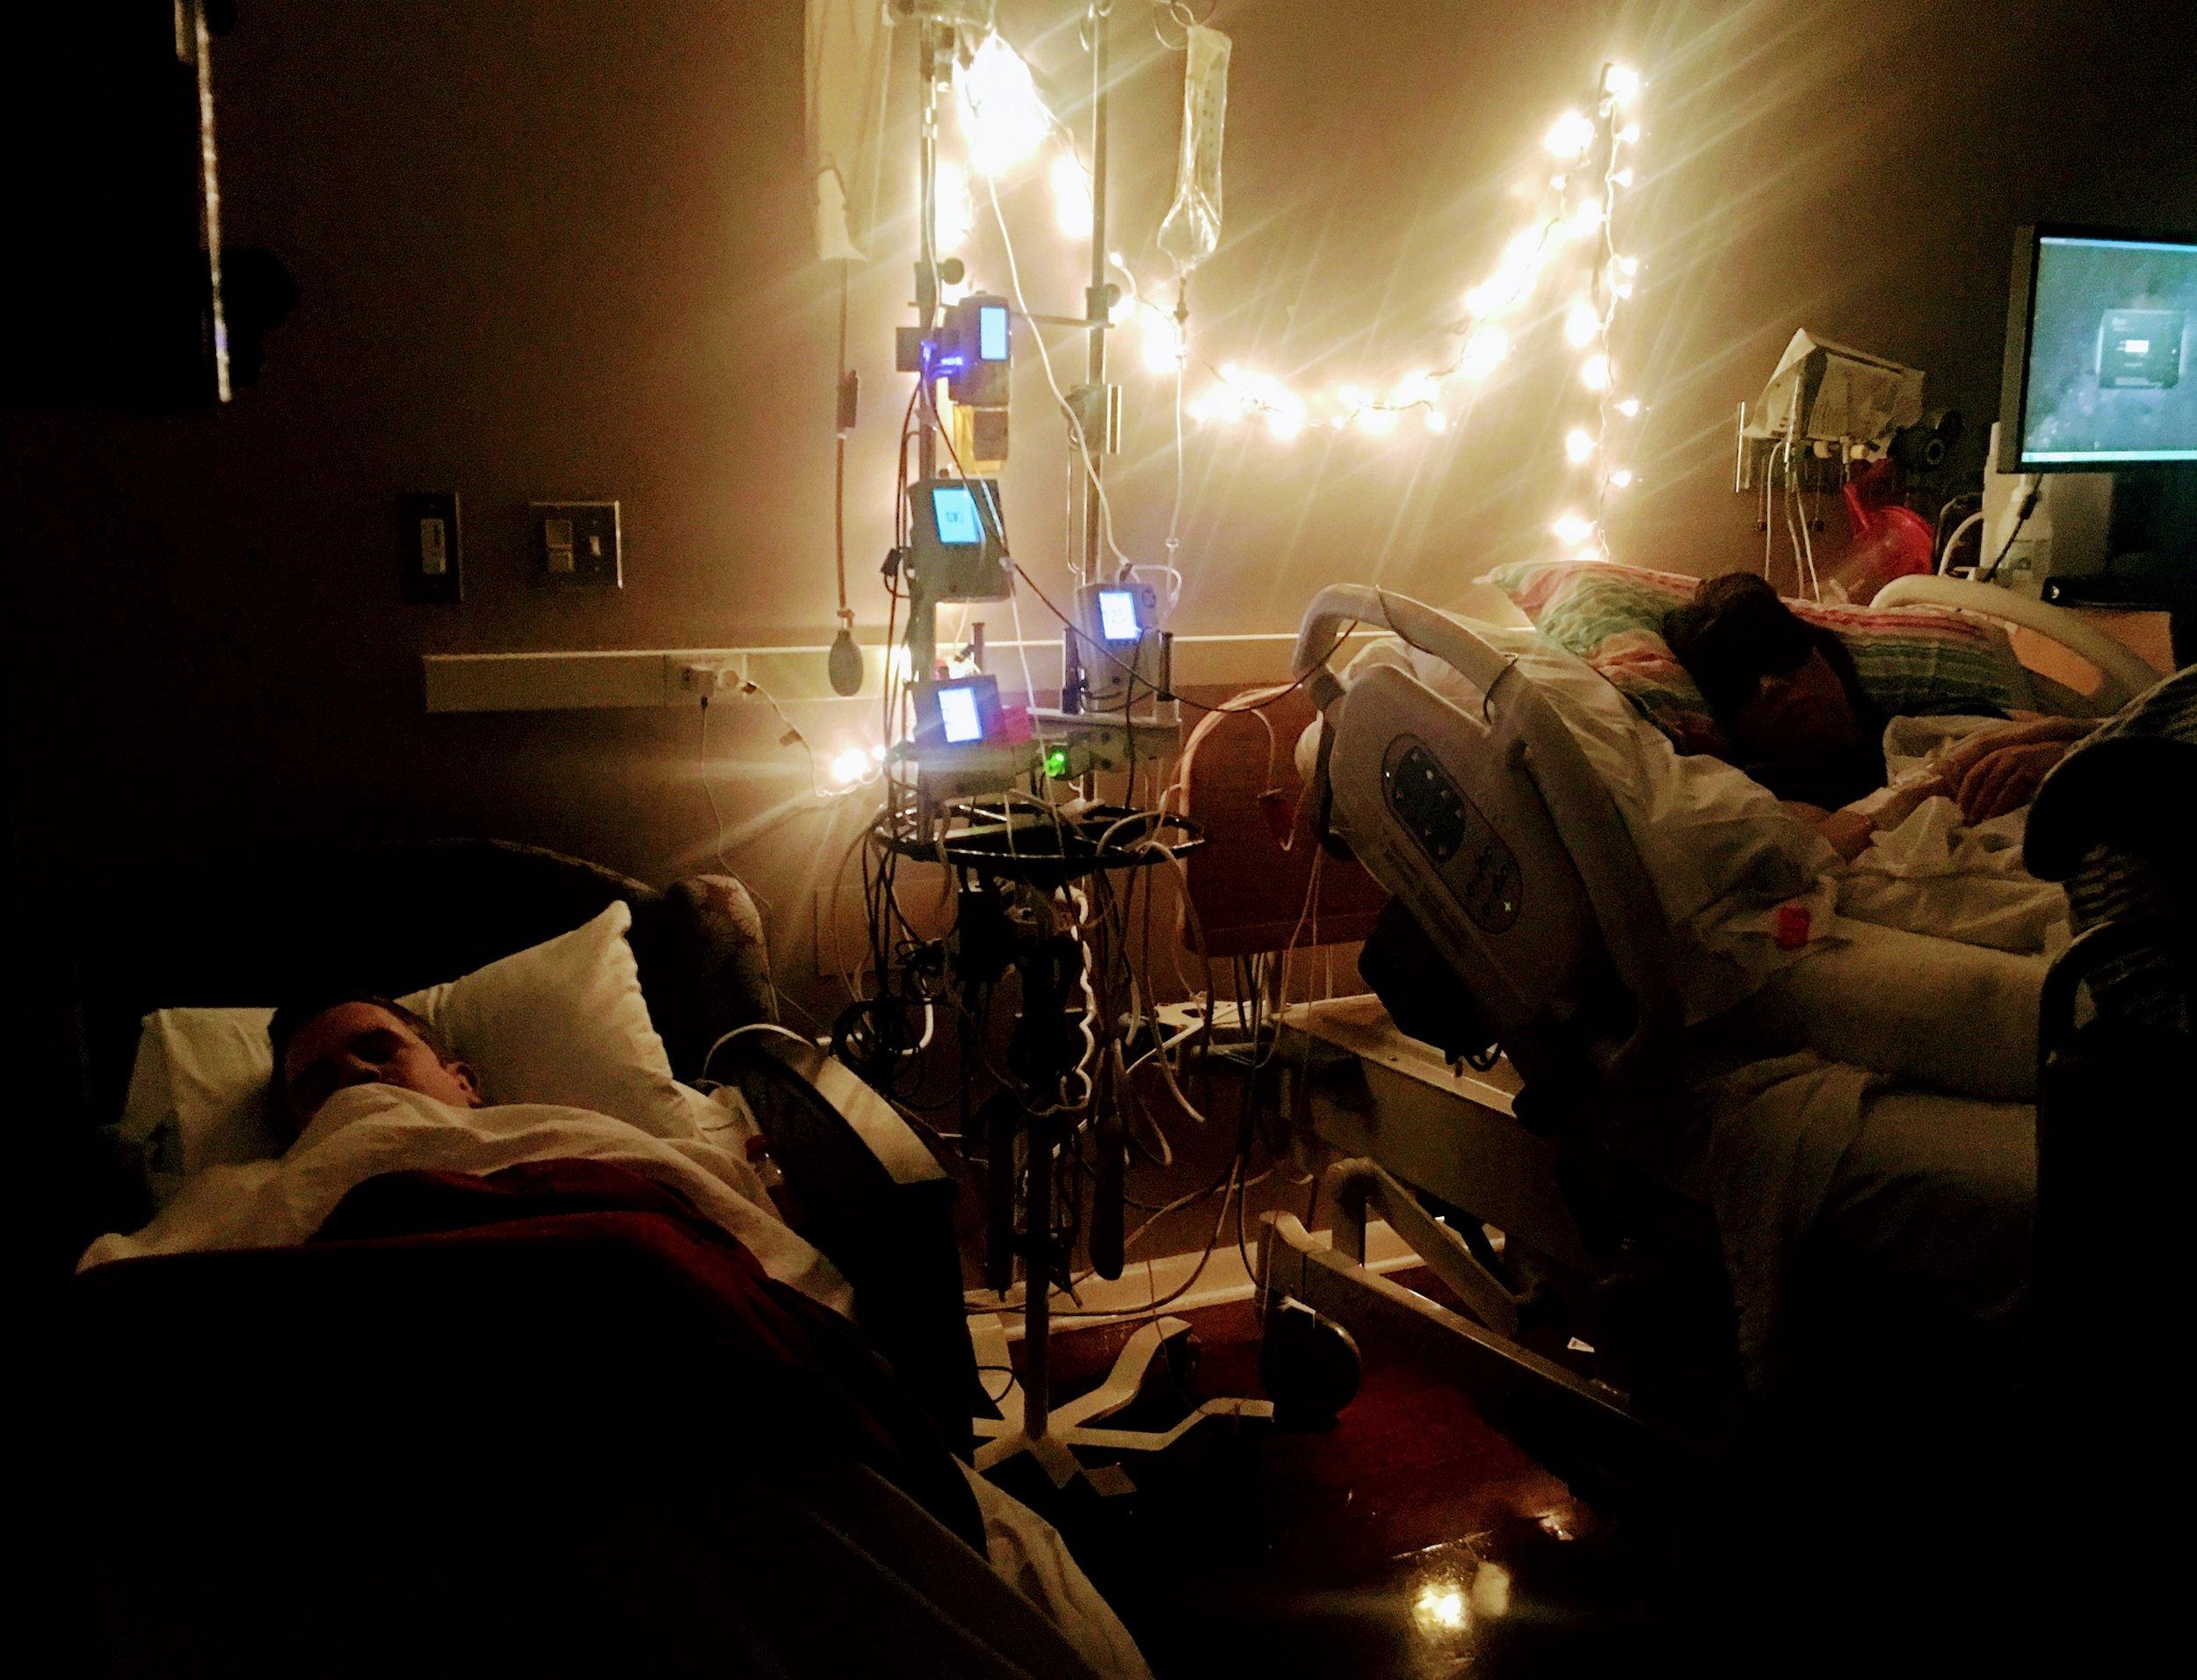 Time to rest, for a TOLAC at  Inova Fair Oaks Hospital  with Tabitha Kaza